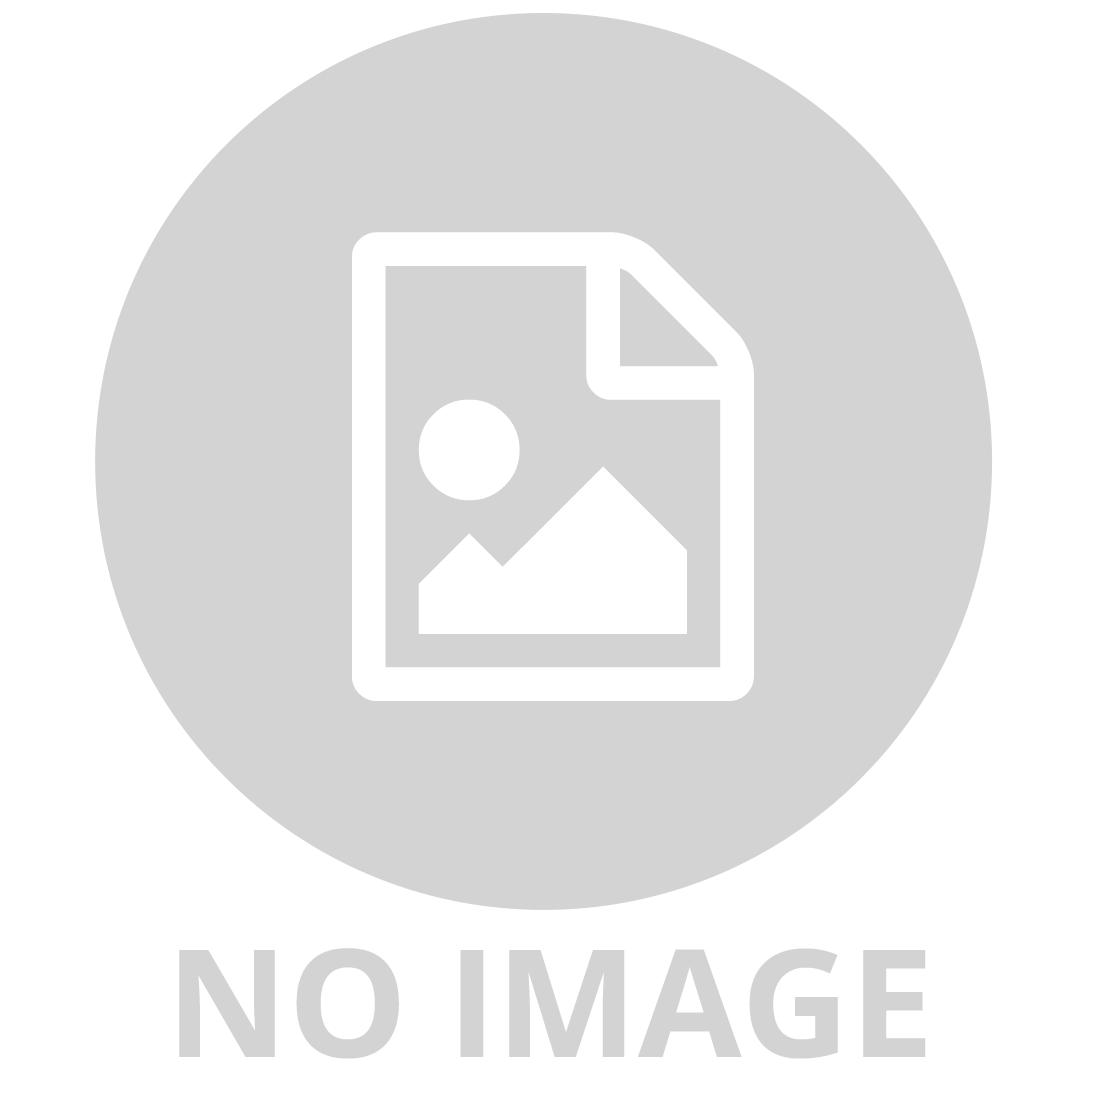 MAGTASTIX- 20 PIECE SET